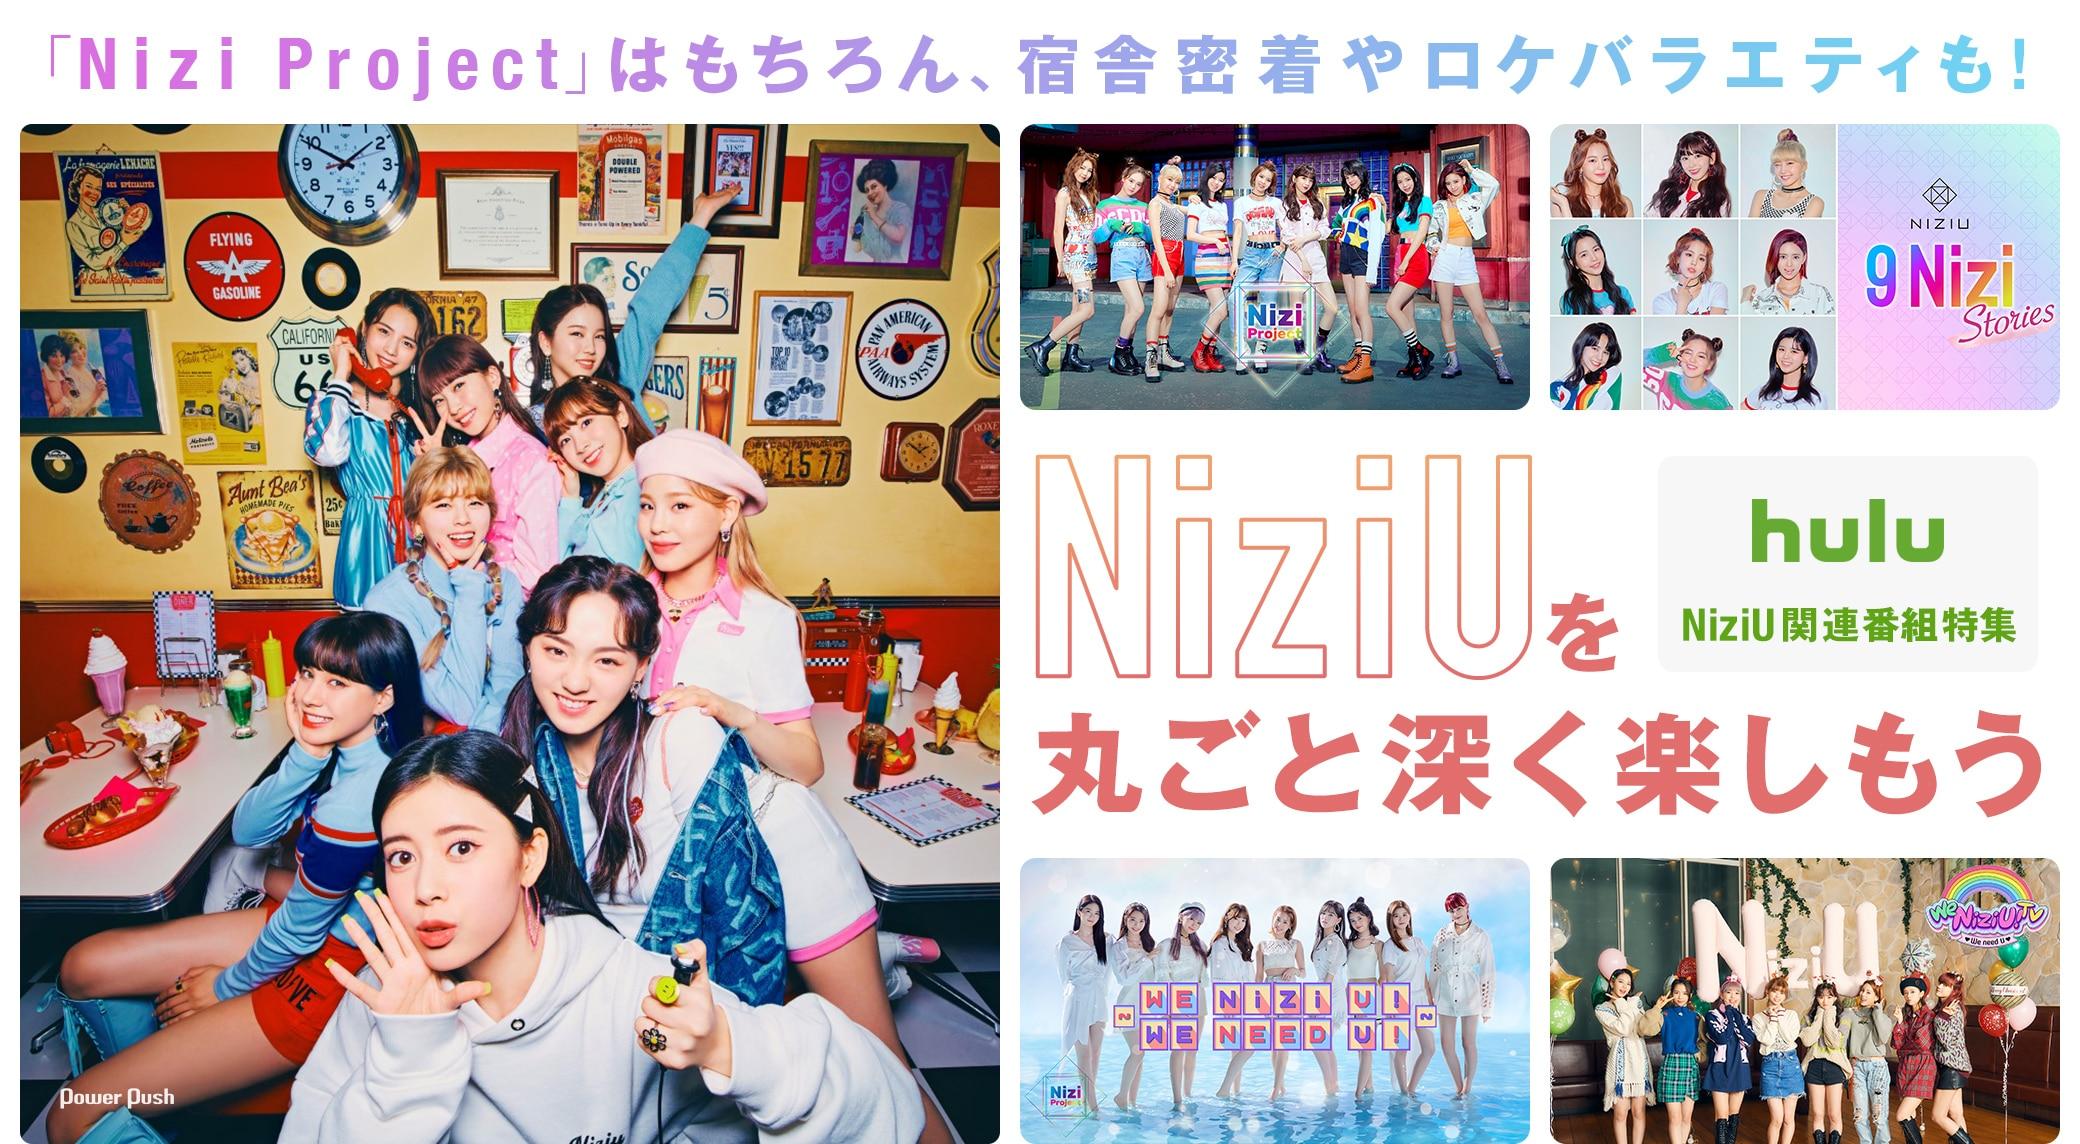 「Nizi Project」はもちろん、宿舎密着やロケバラエティも!Hulu NiziU関連番組特集 NiziU を丸ごと深く楽しもう